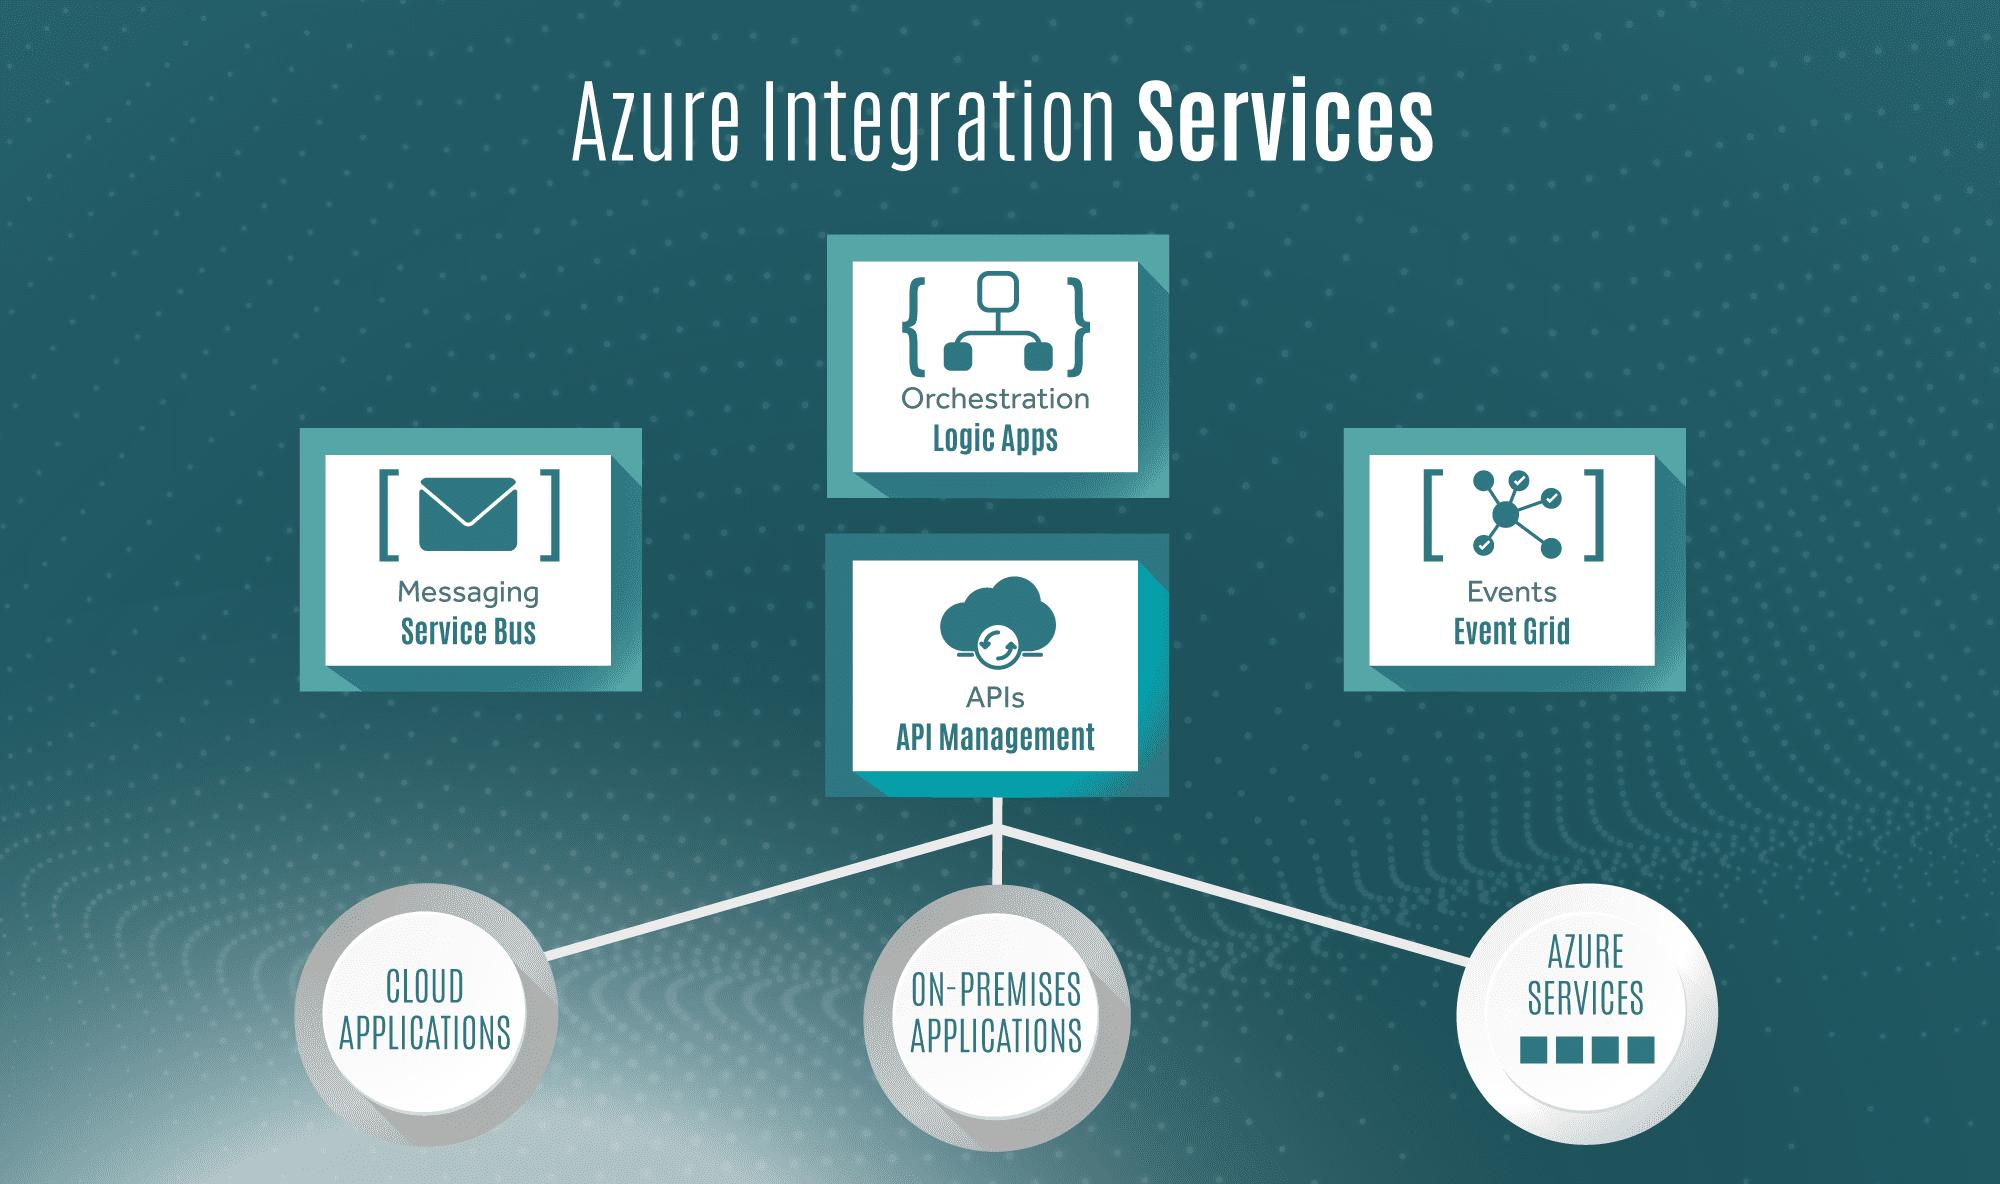 Azure Integration Services